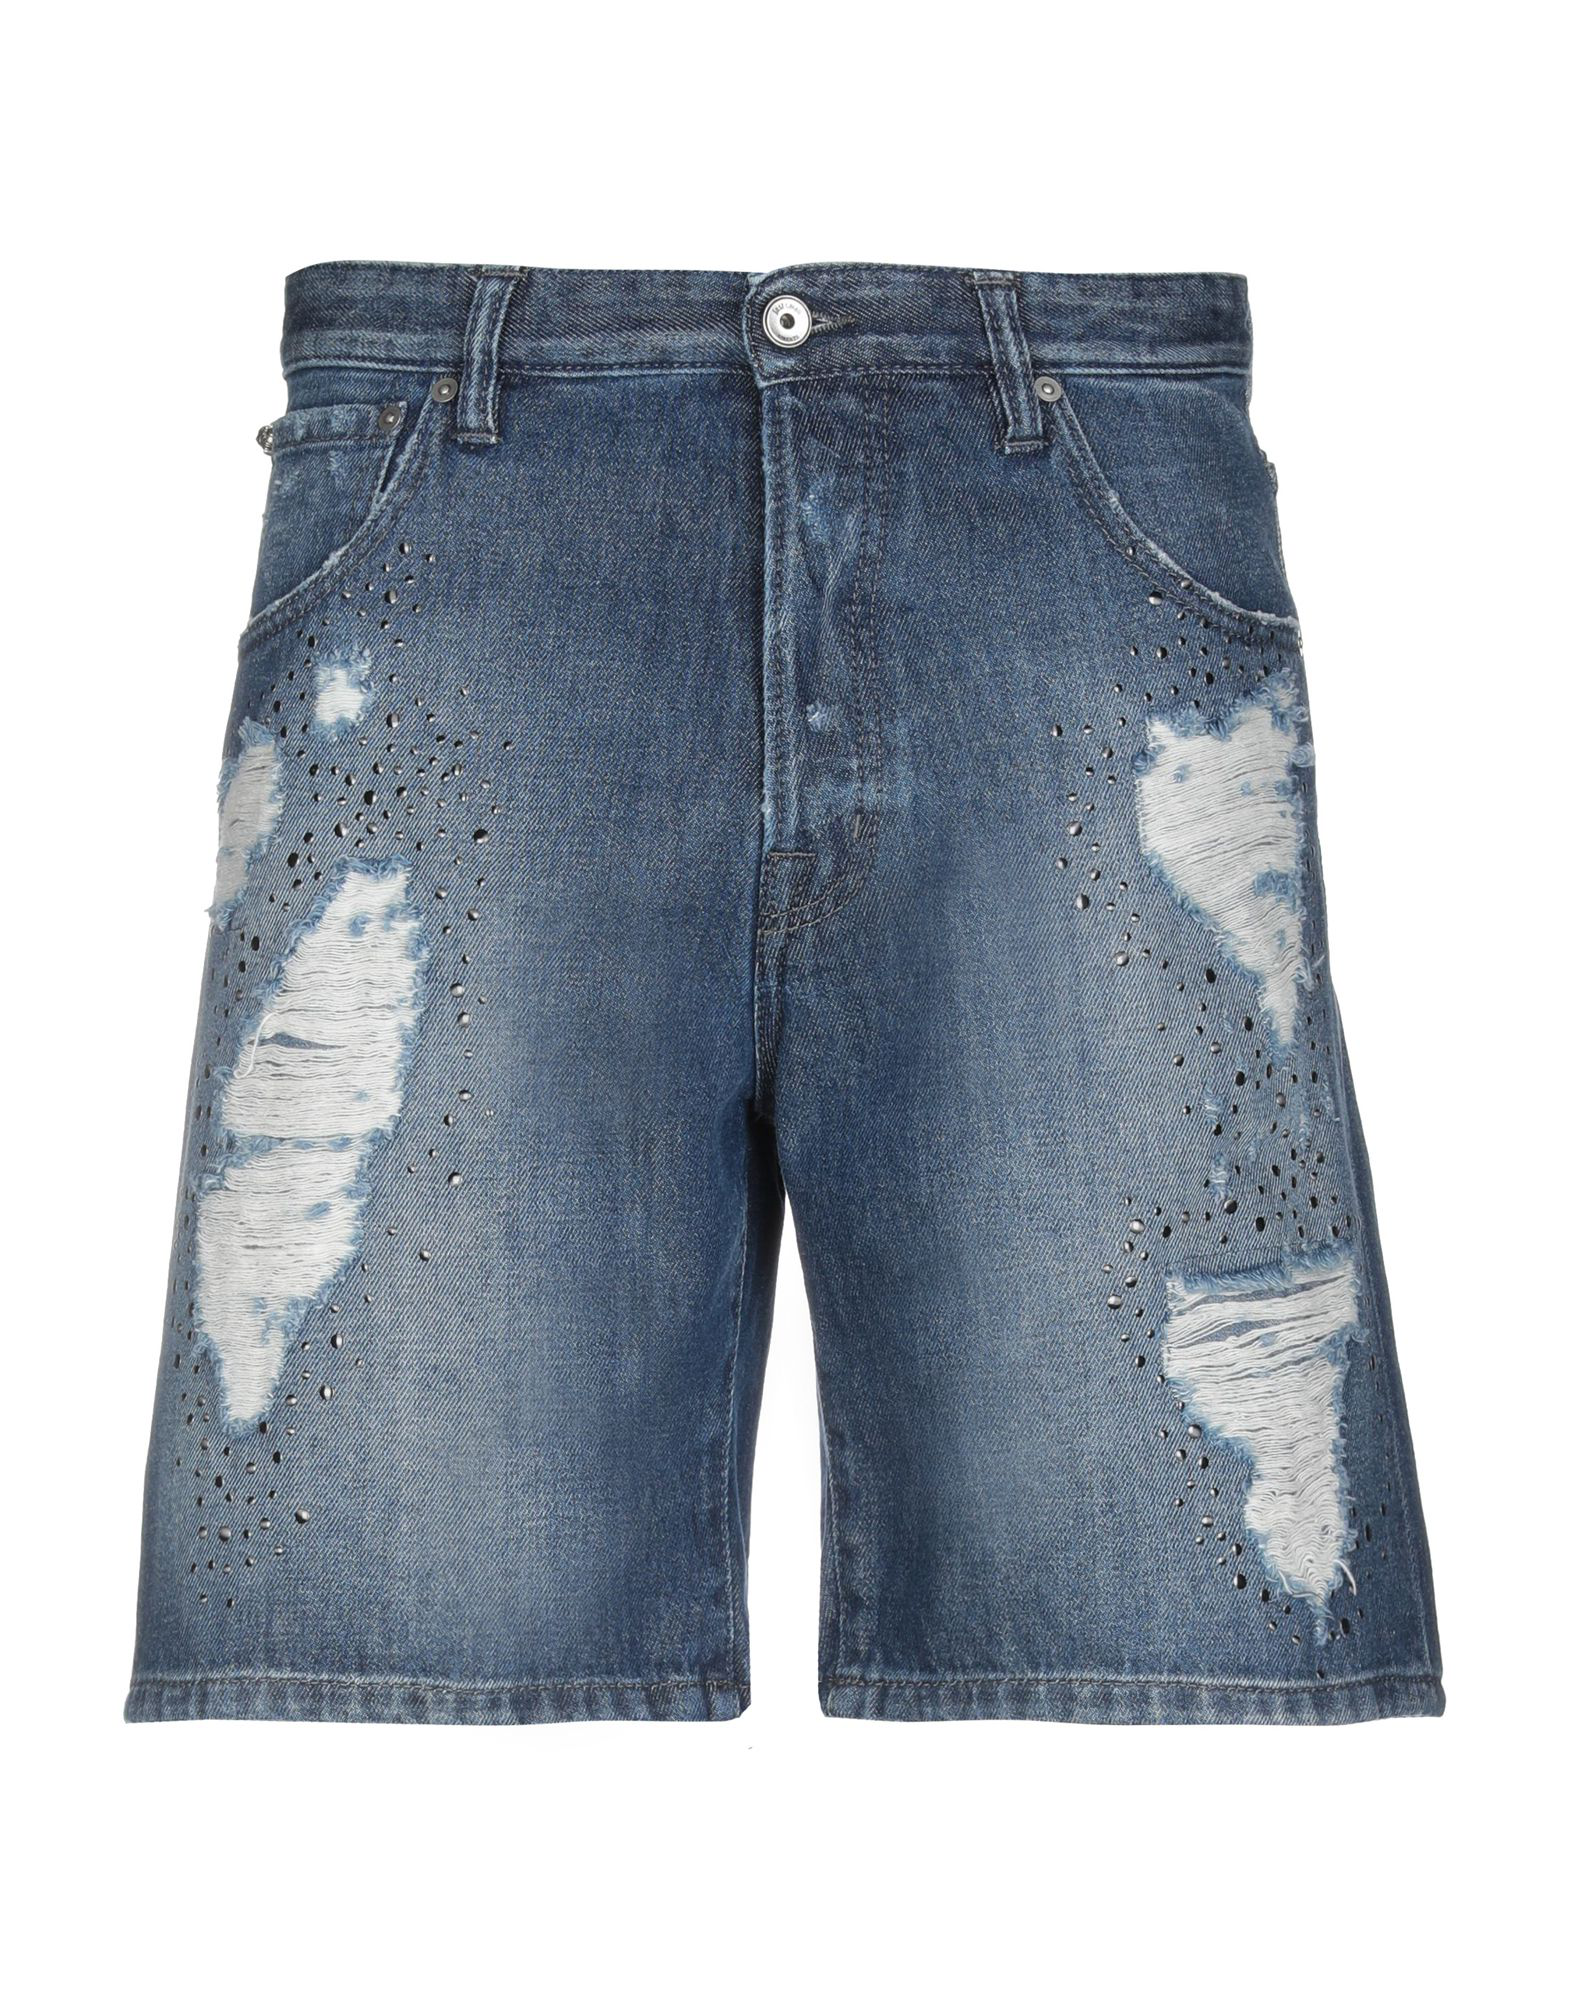 Just Cavalli Denim Shorts In Blue